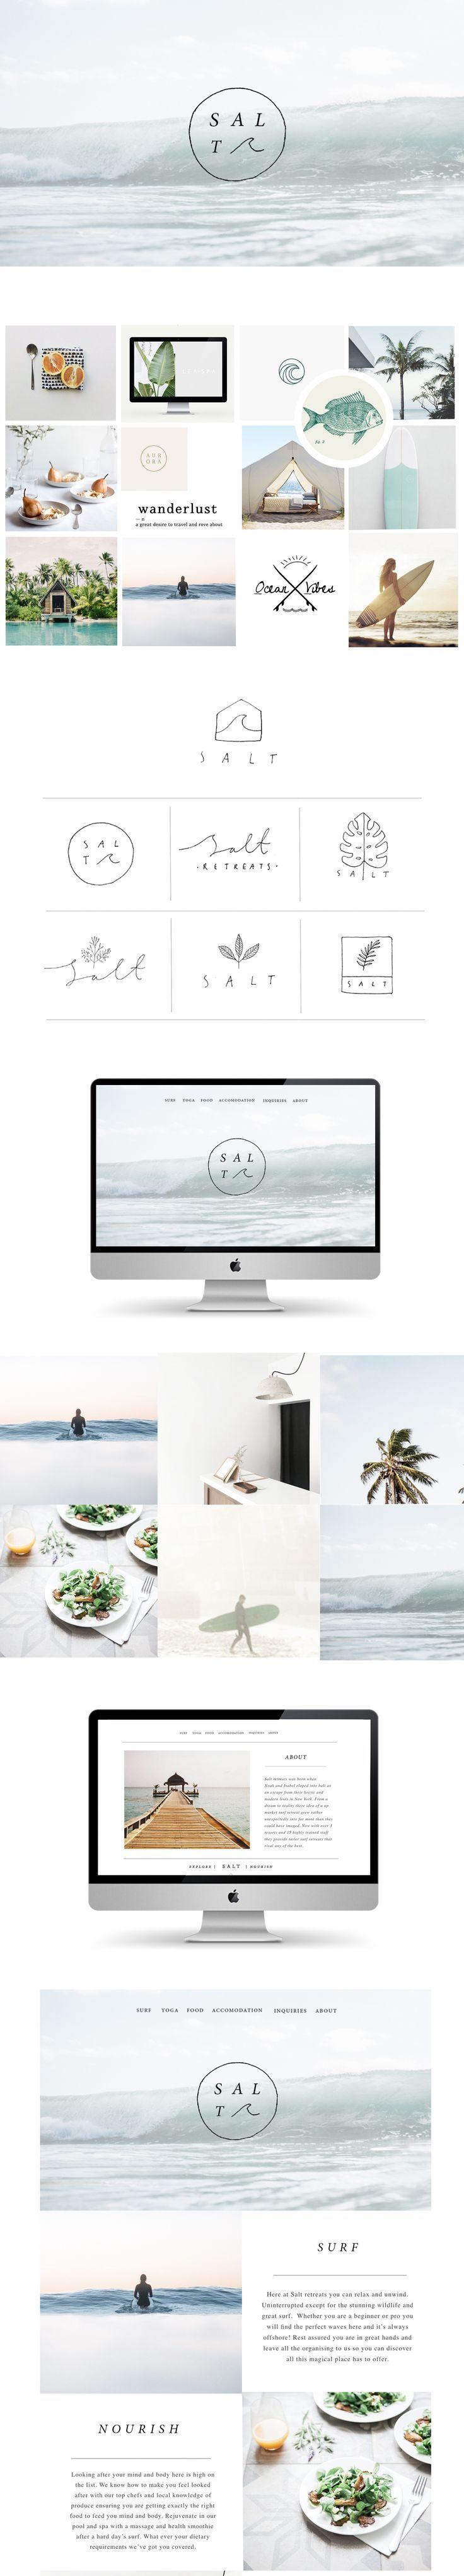 Branding and website design for Salt retreats by Ryn Frank www.rynfrankdesign.co.uk